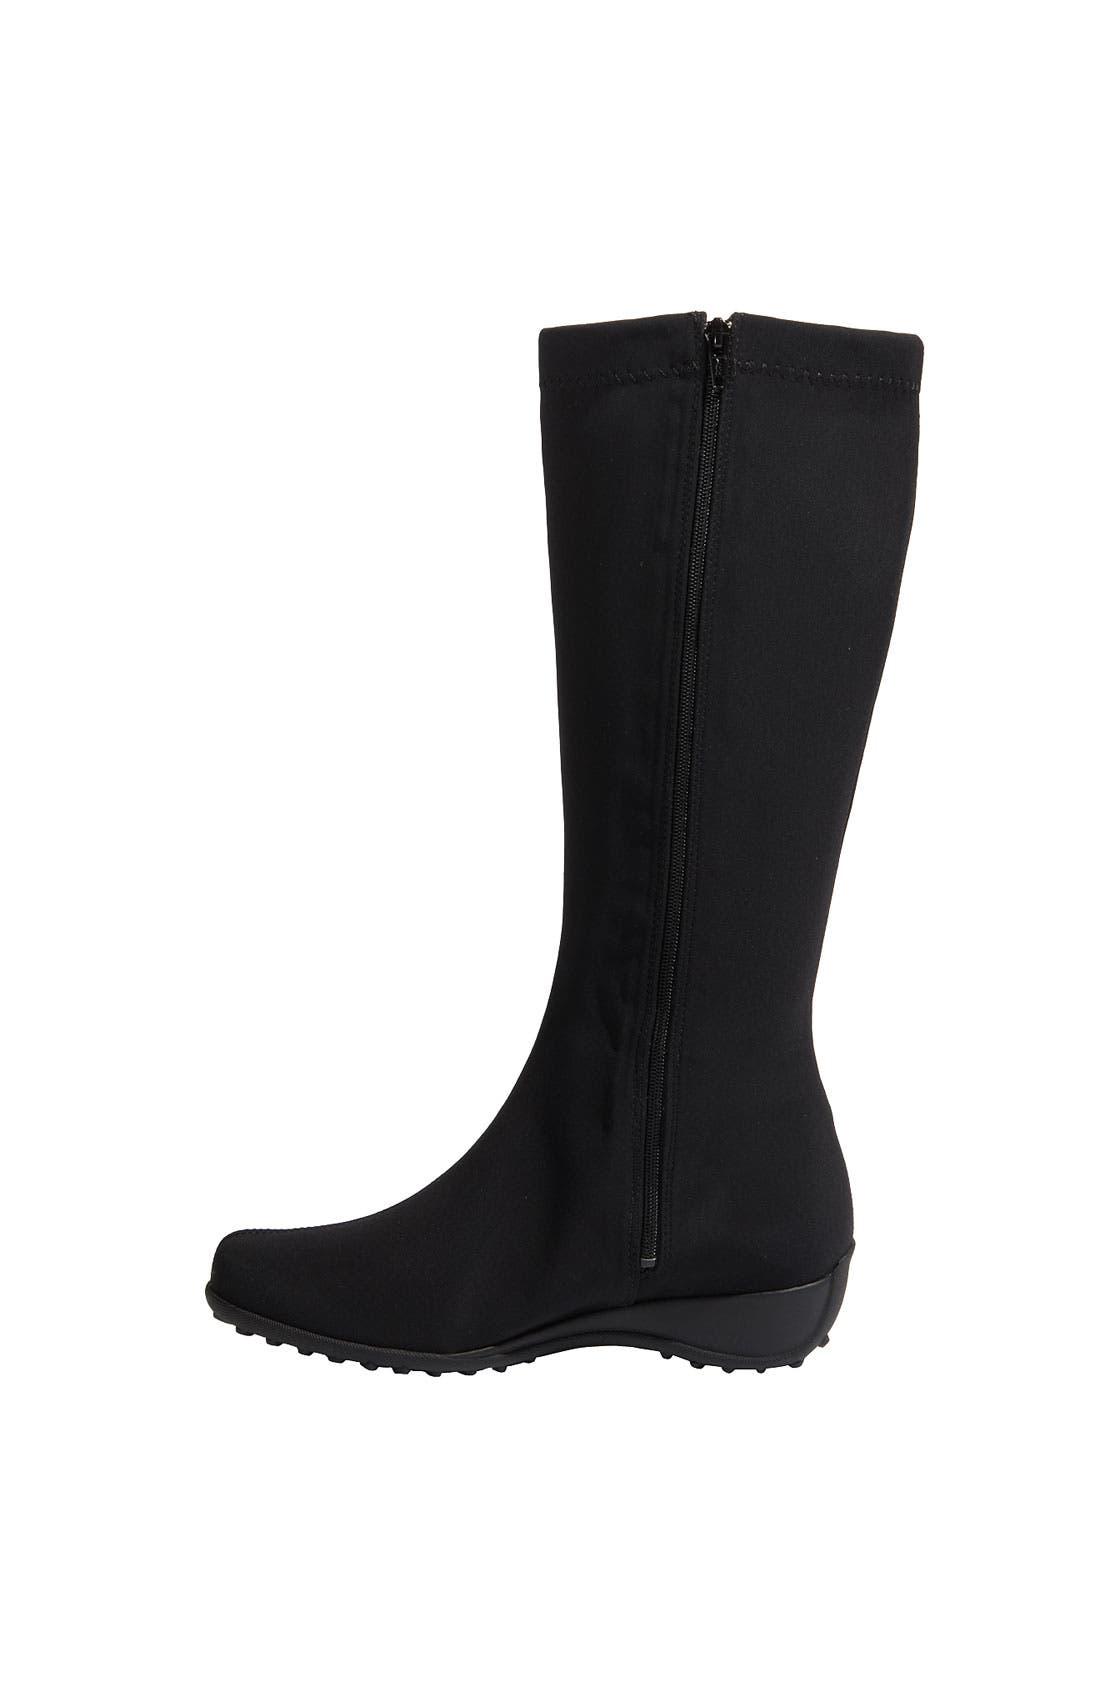 'Linda' Waterproof Stretch Boot,                             Alternate thumbnail 2, color,                             009